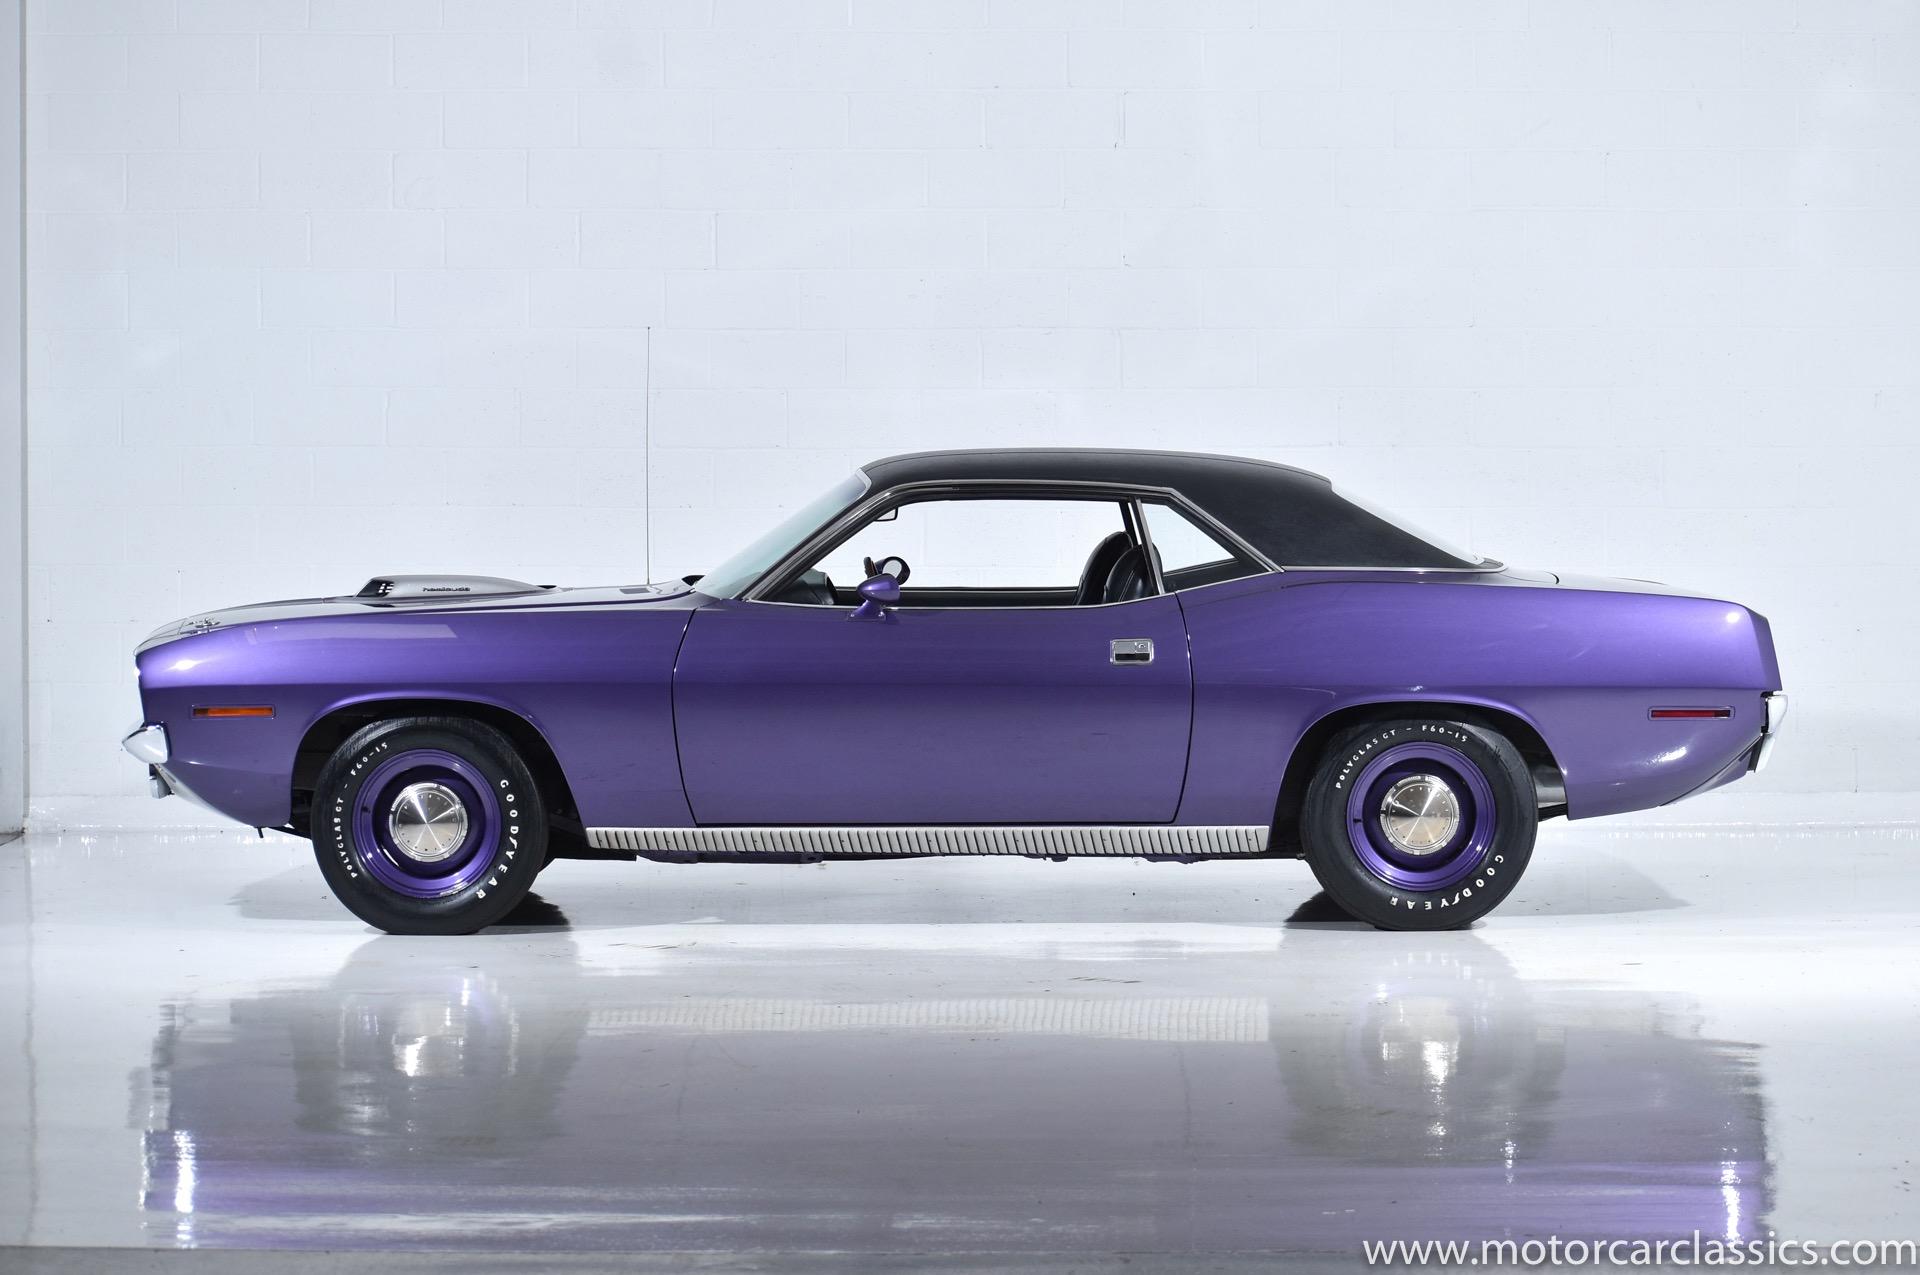 1970 Plymouth Barracuda HEMI